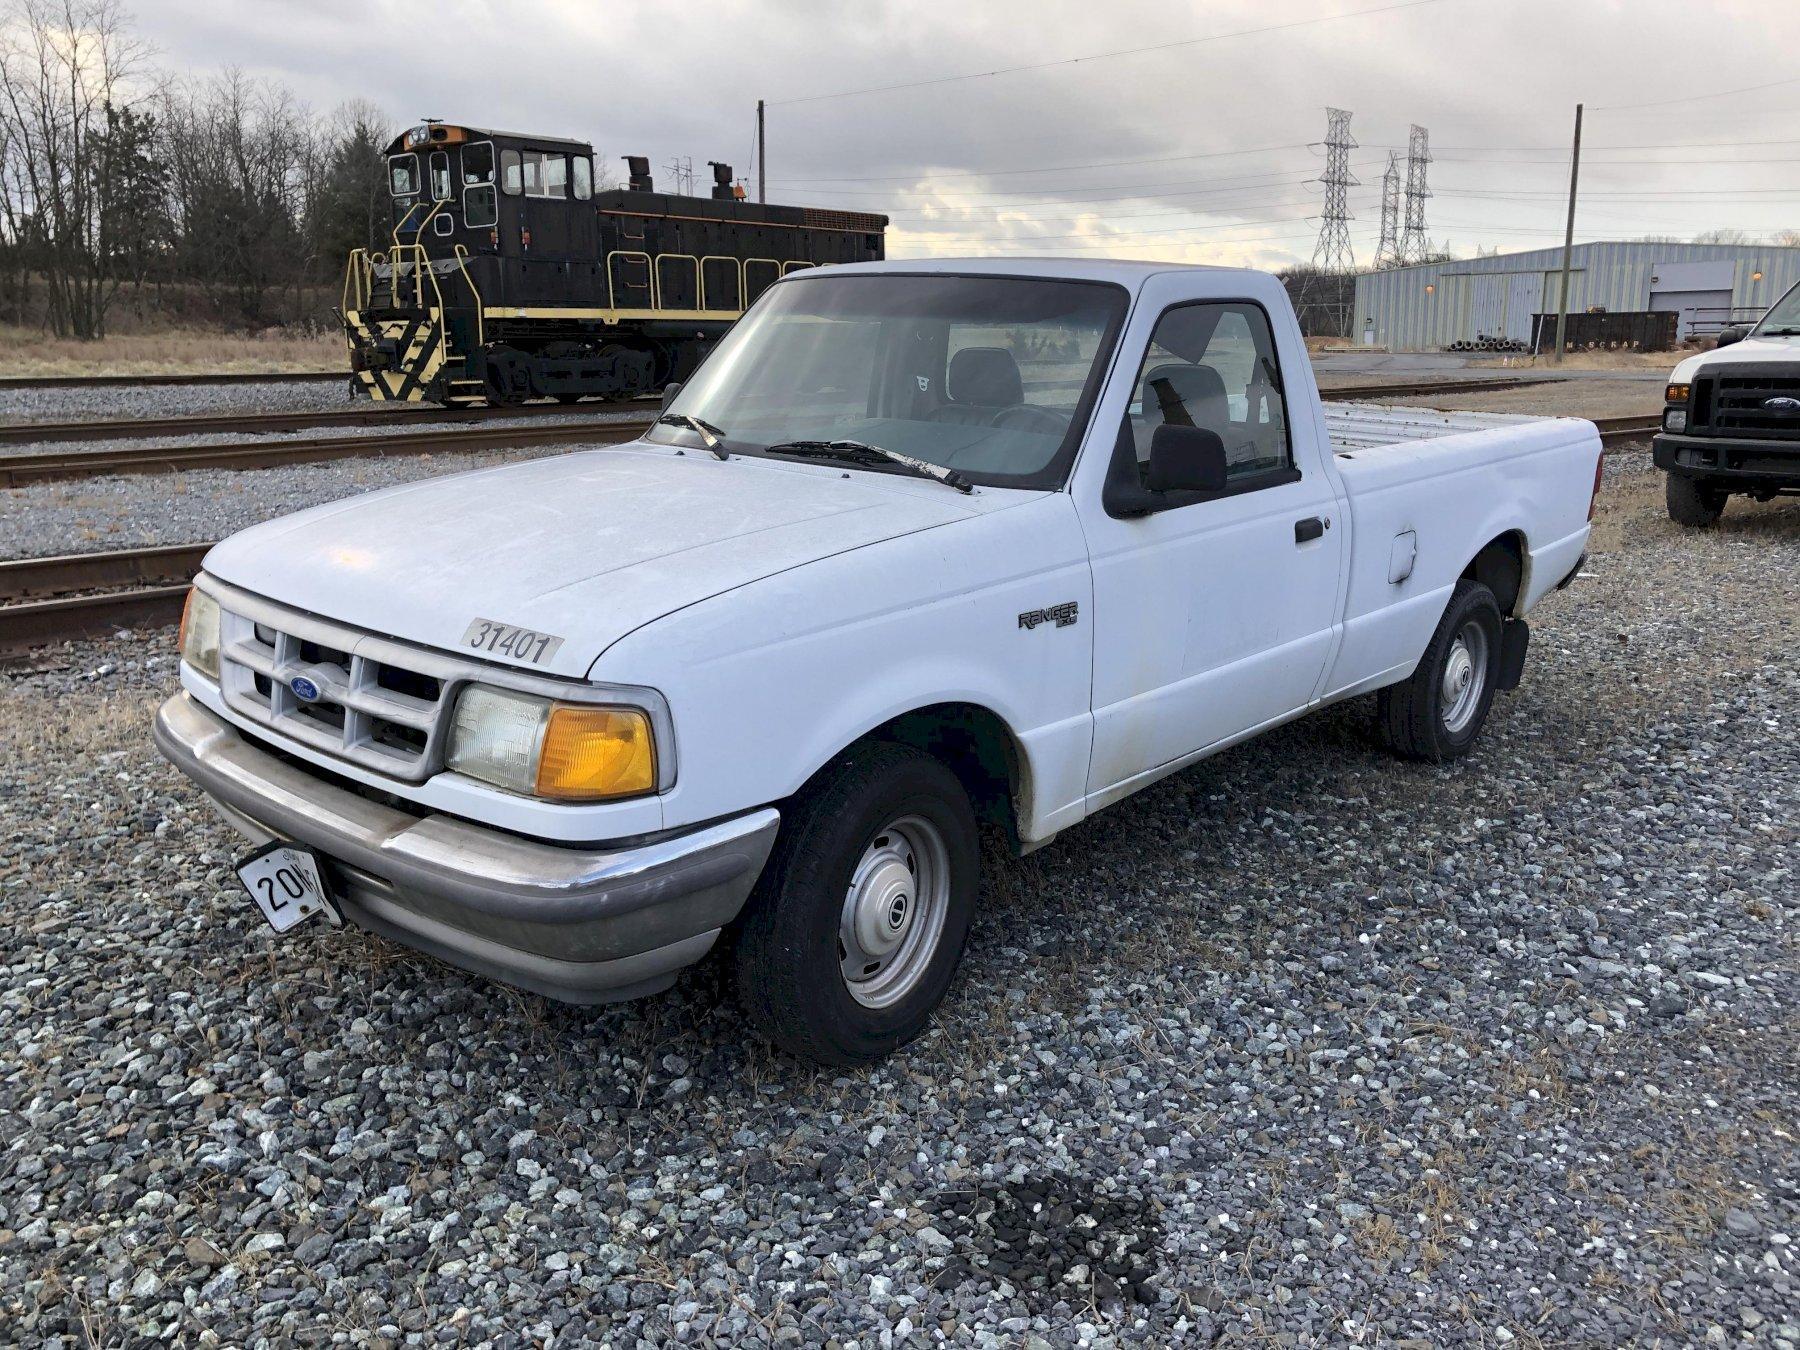 1992 Ford ranger xl pickup truck vin# 1ftcr10a0pub06436